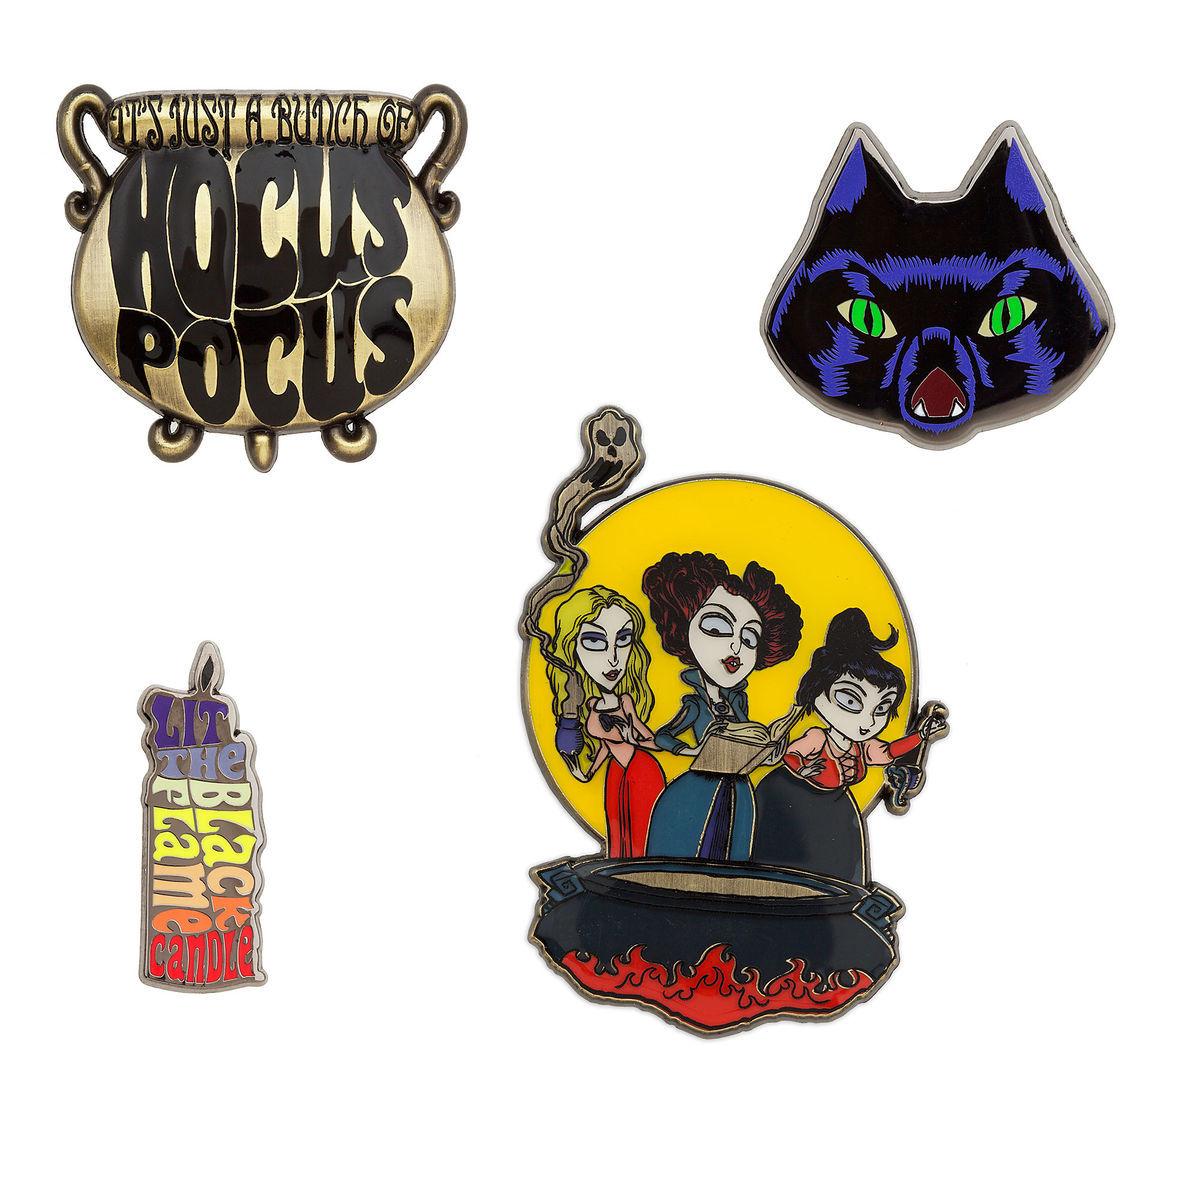 Hocus Pocus Merchandise Now Available! Details Below! #DisneyStyle 6